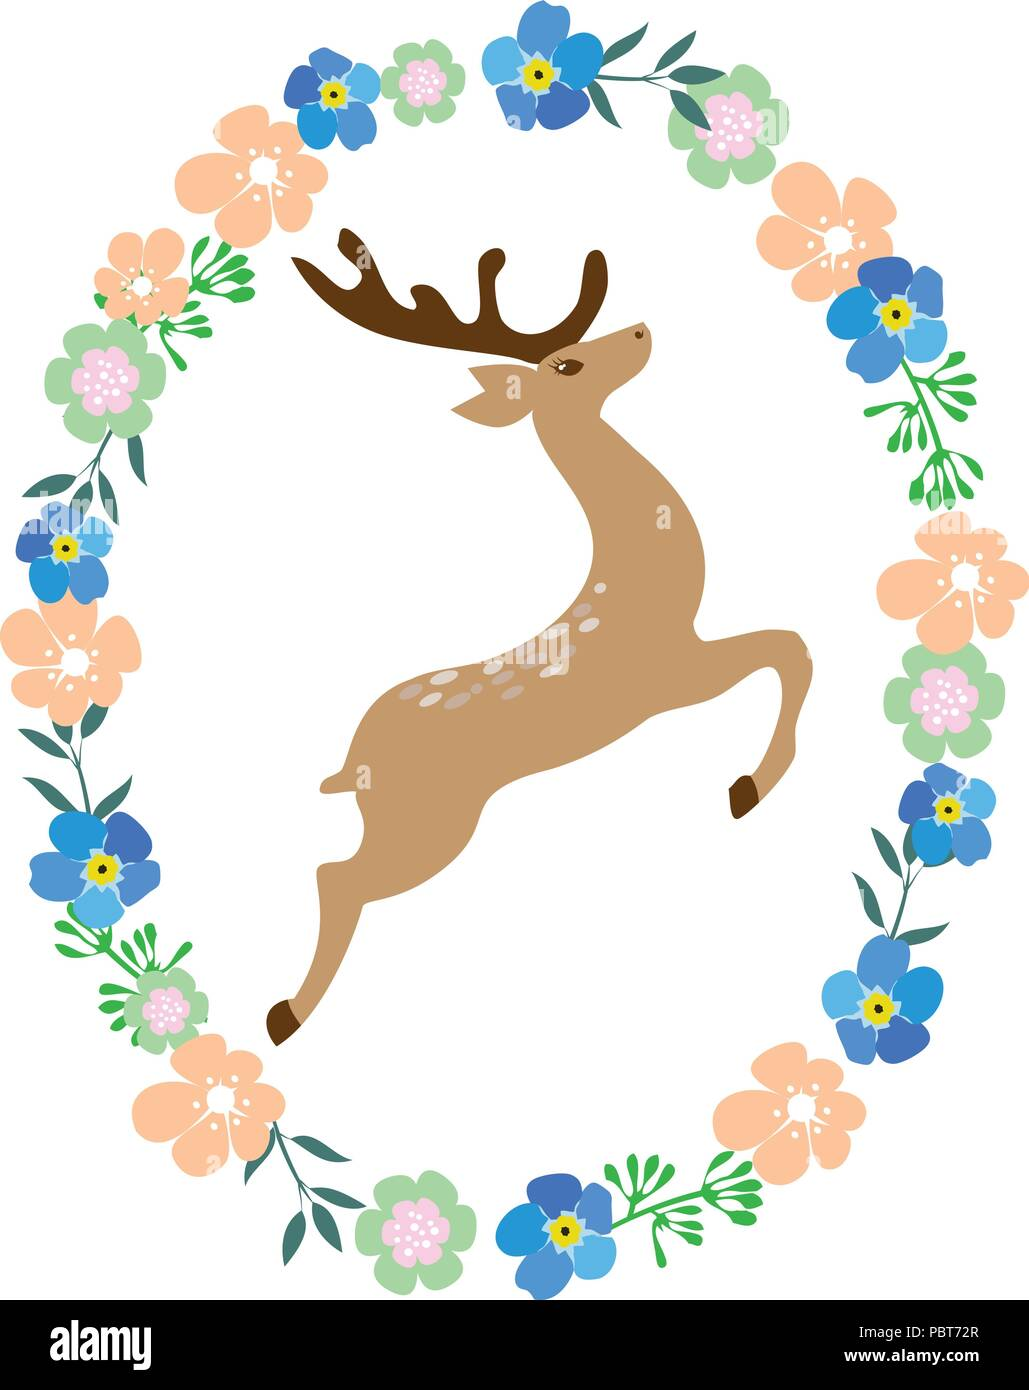 vector illustration of a deer in floral frame Stock Vector Art ...